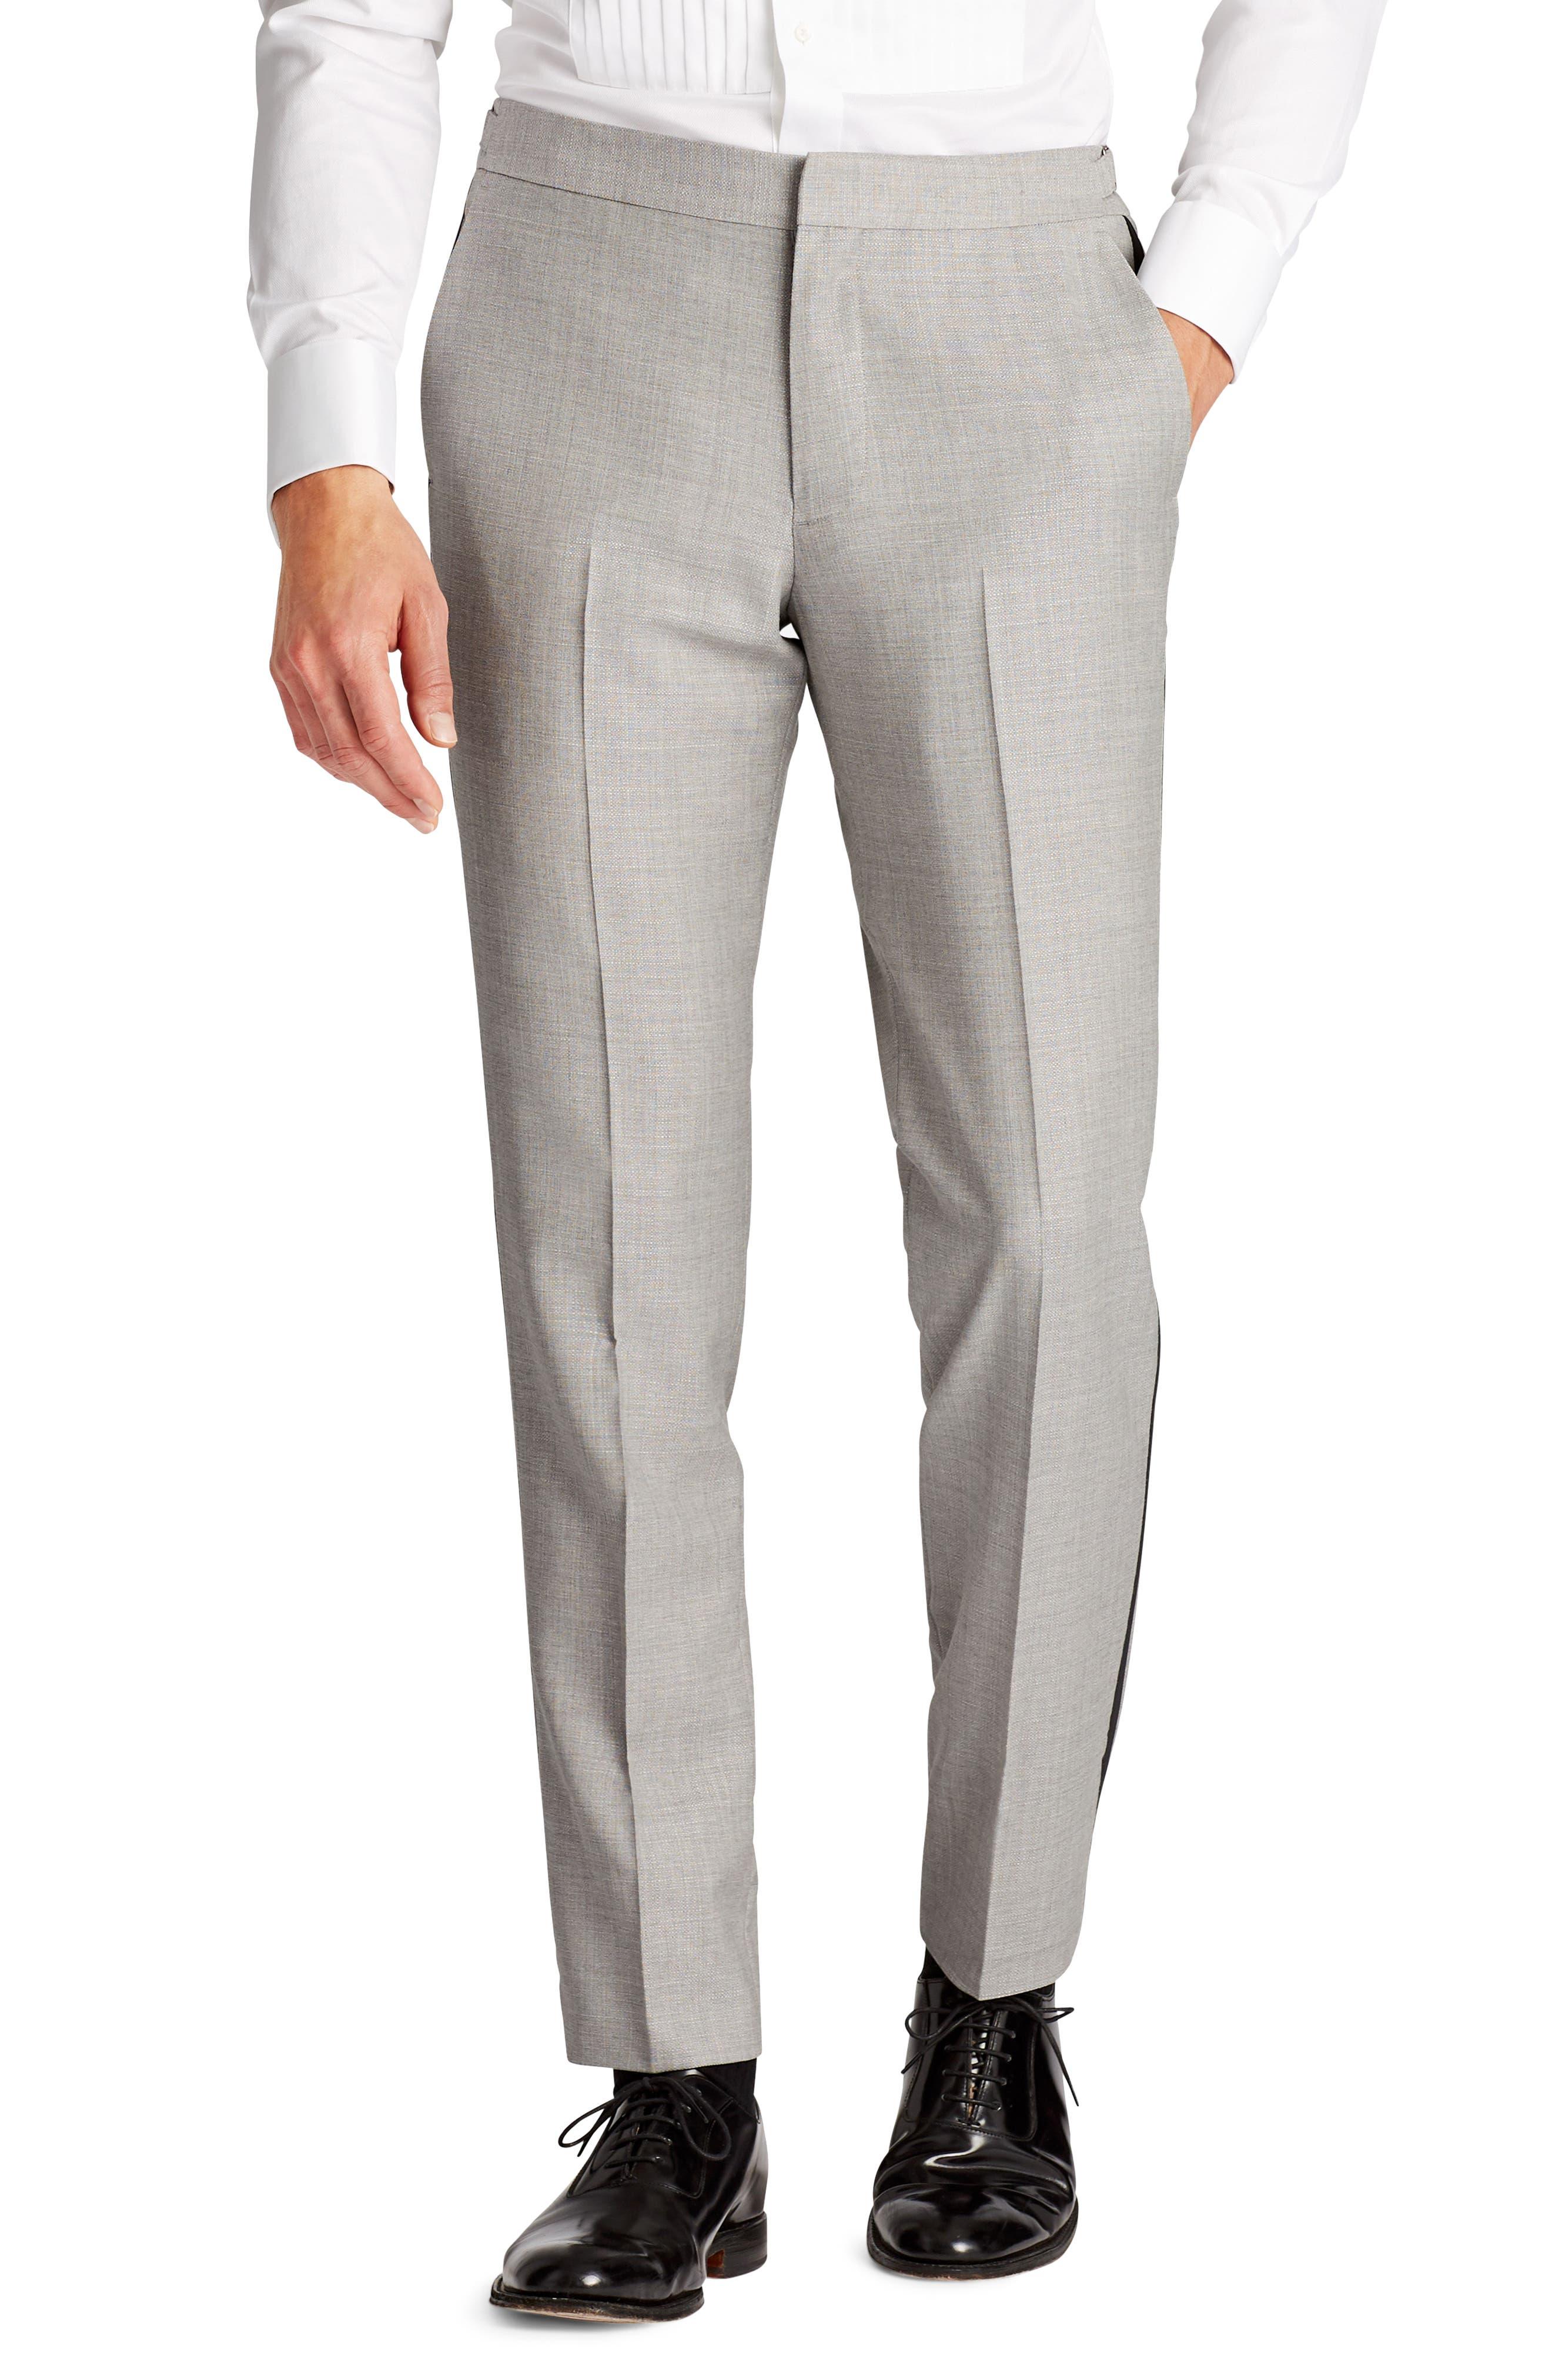 Capstone Flat Front Tuxedo Trousers,                             Main thumbnail 1, color,                             Pearl Grey